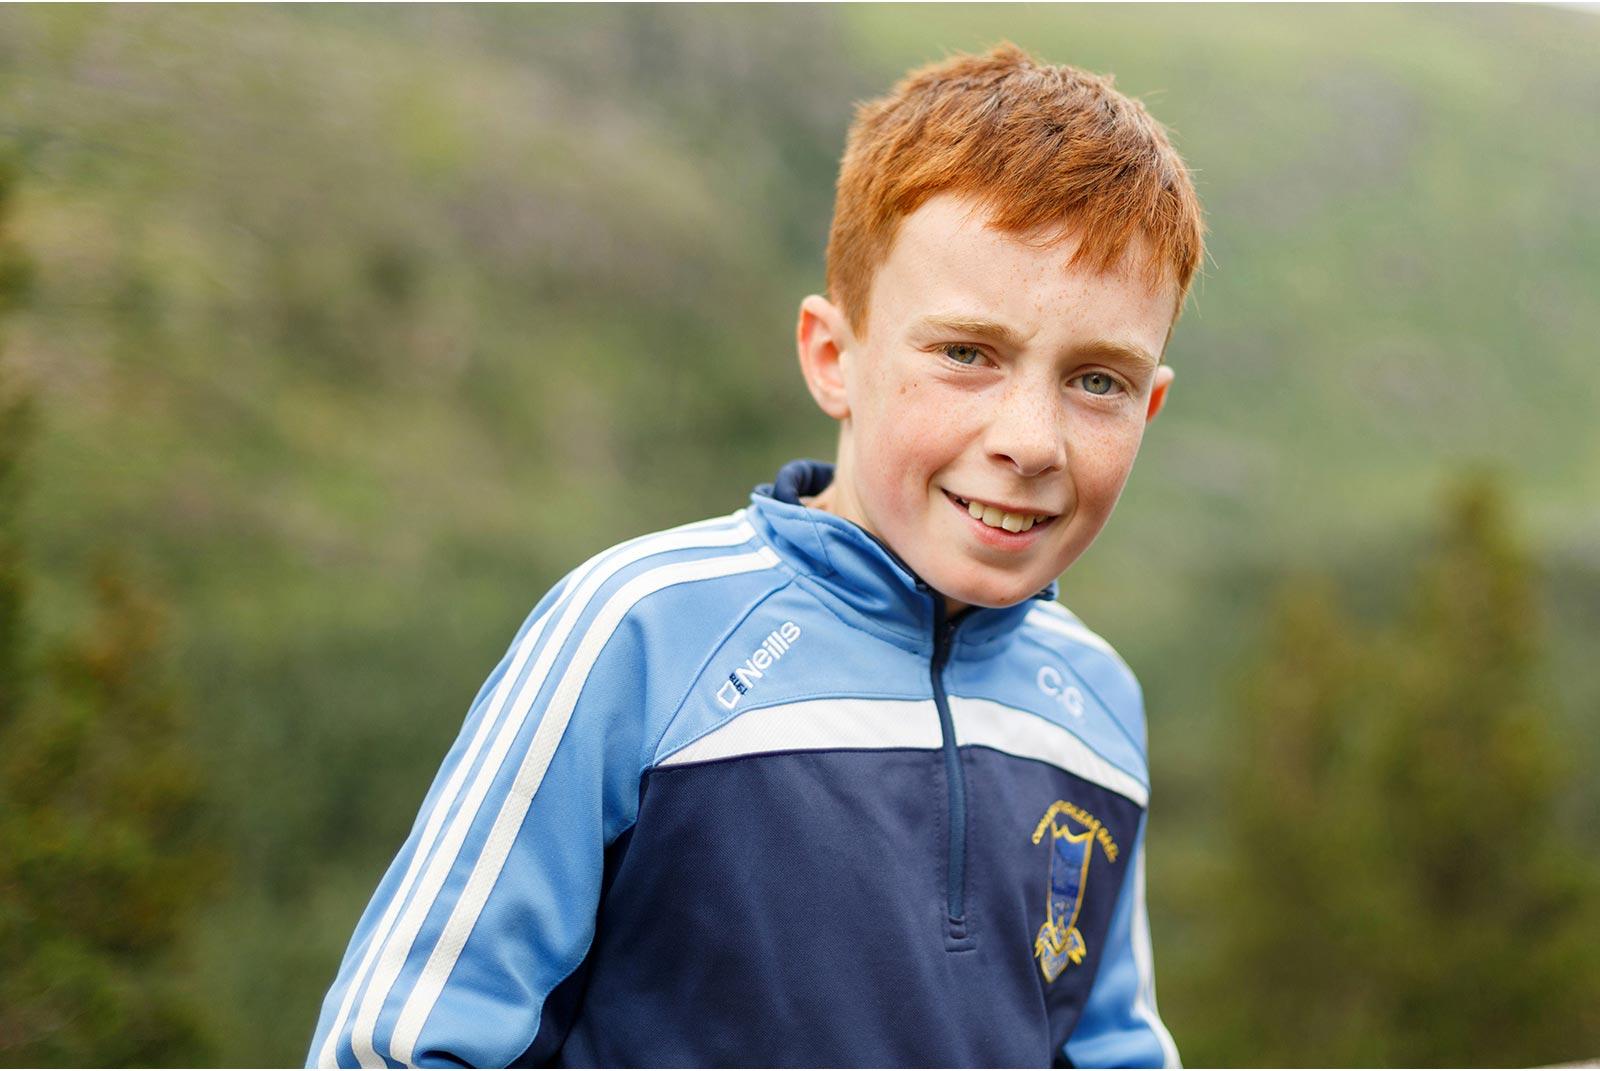 Smiling Irish boy looks beautiful set agains the green hills